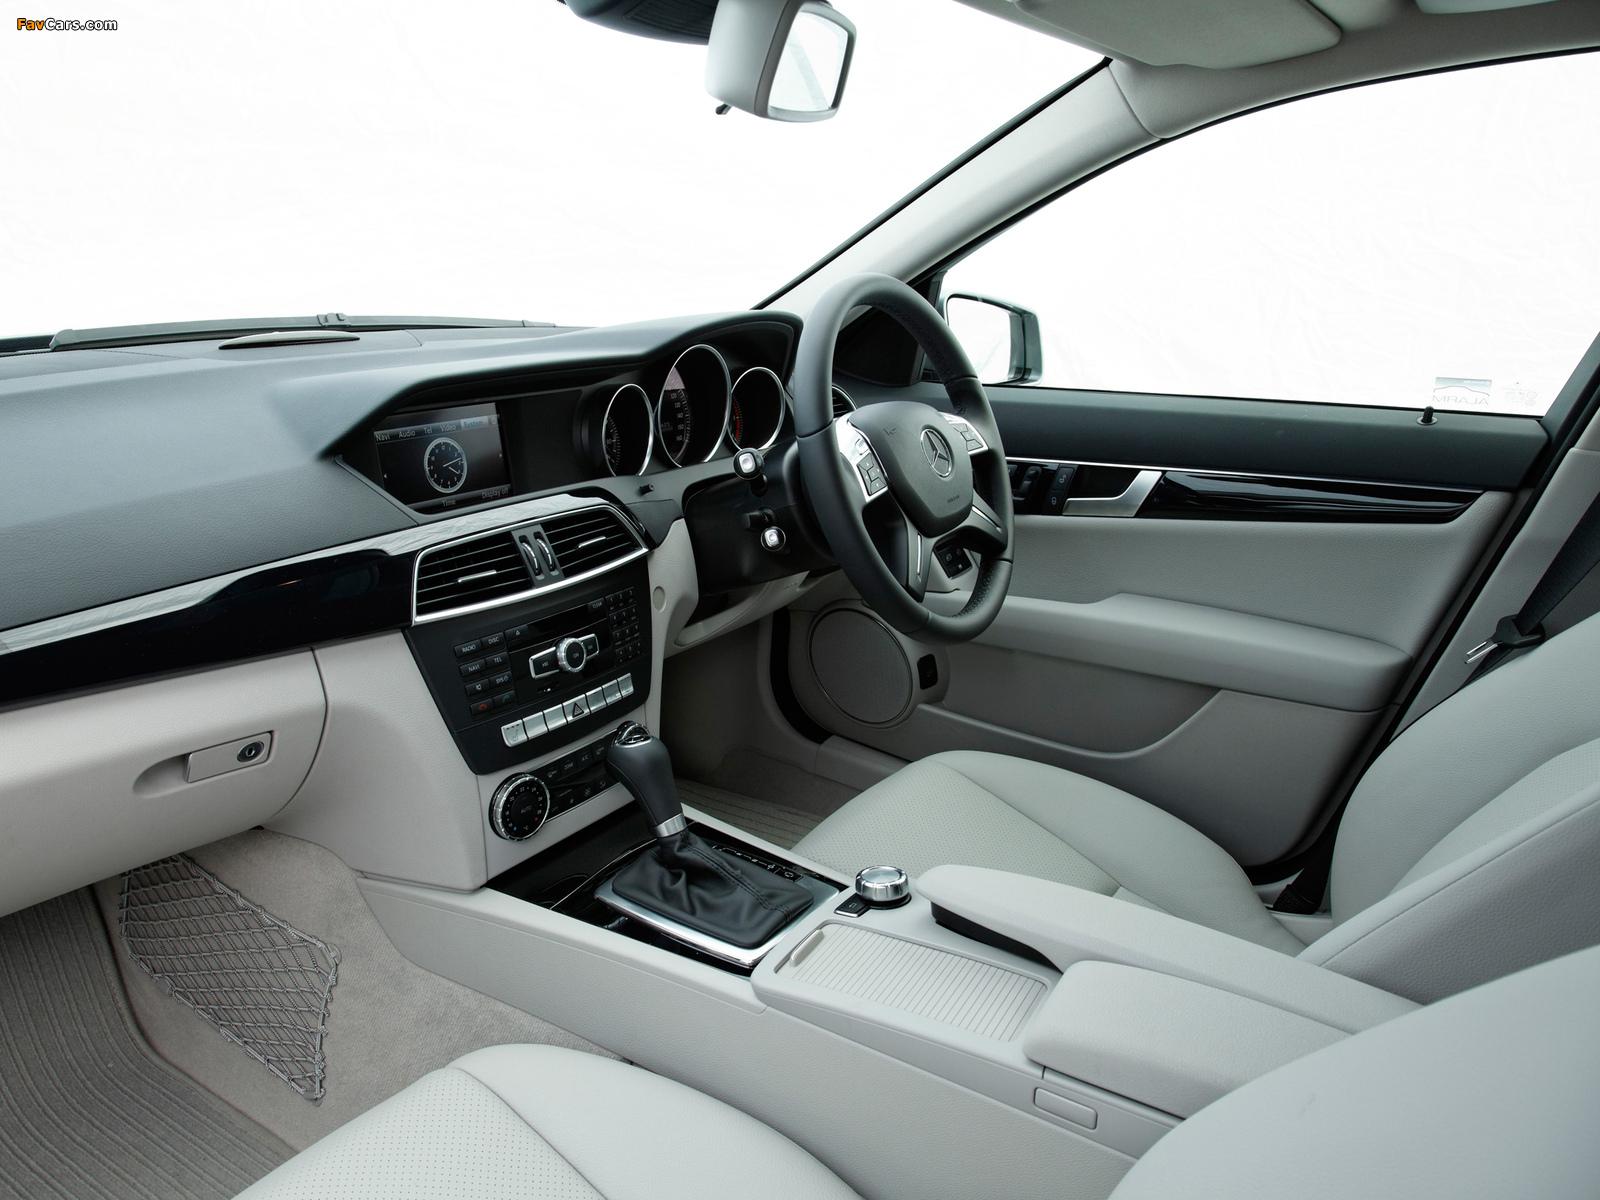 Mercedes-Benz C 220 CDI Estate UK-spec (S204) 2011 wallpapers (1600 x 1200)